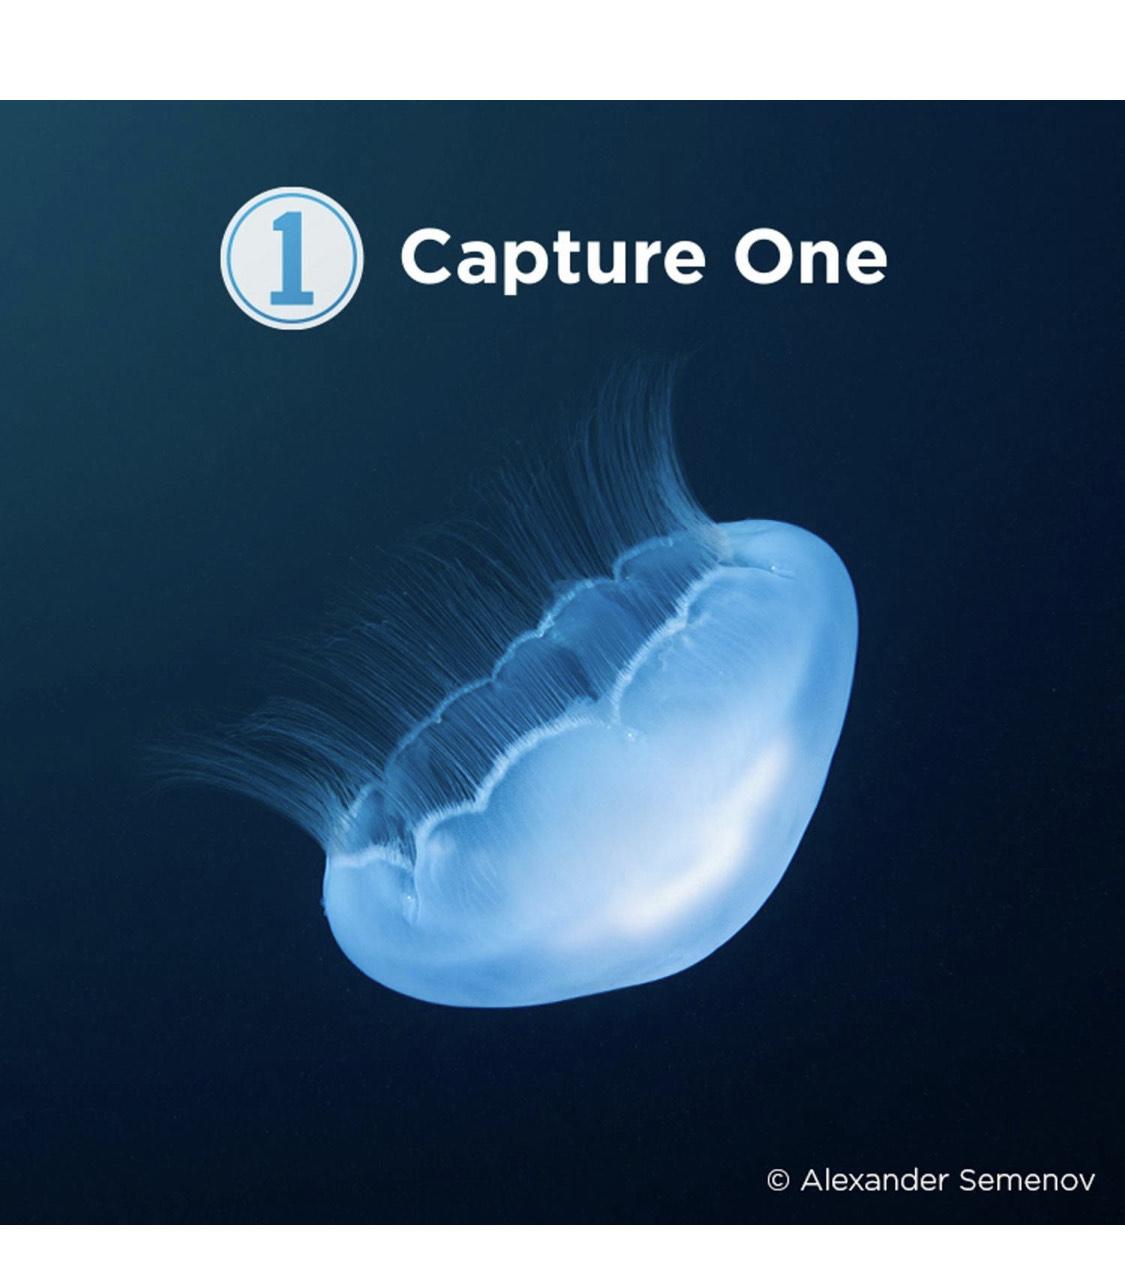 Calumet - Phase One Capture One Pro 20 Downloadkey